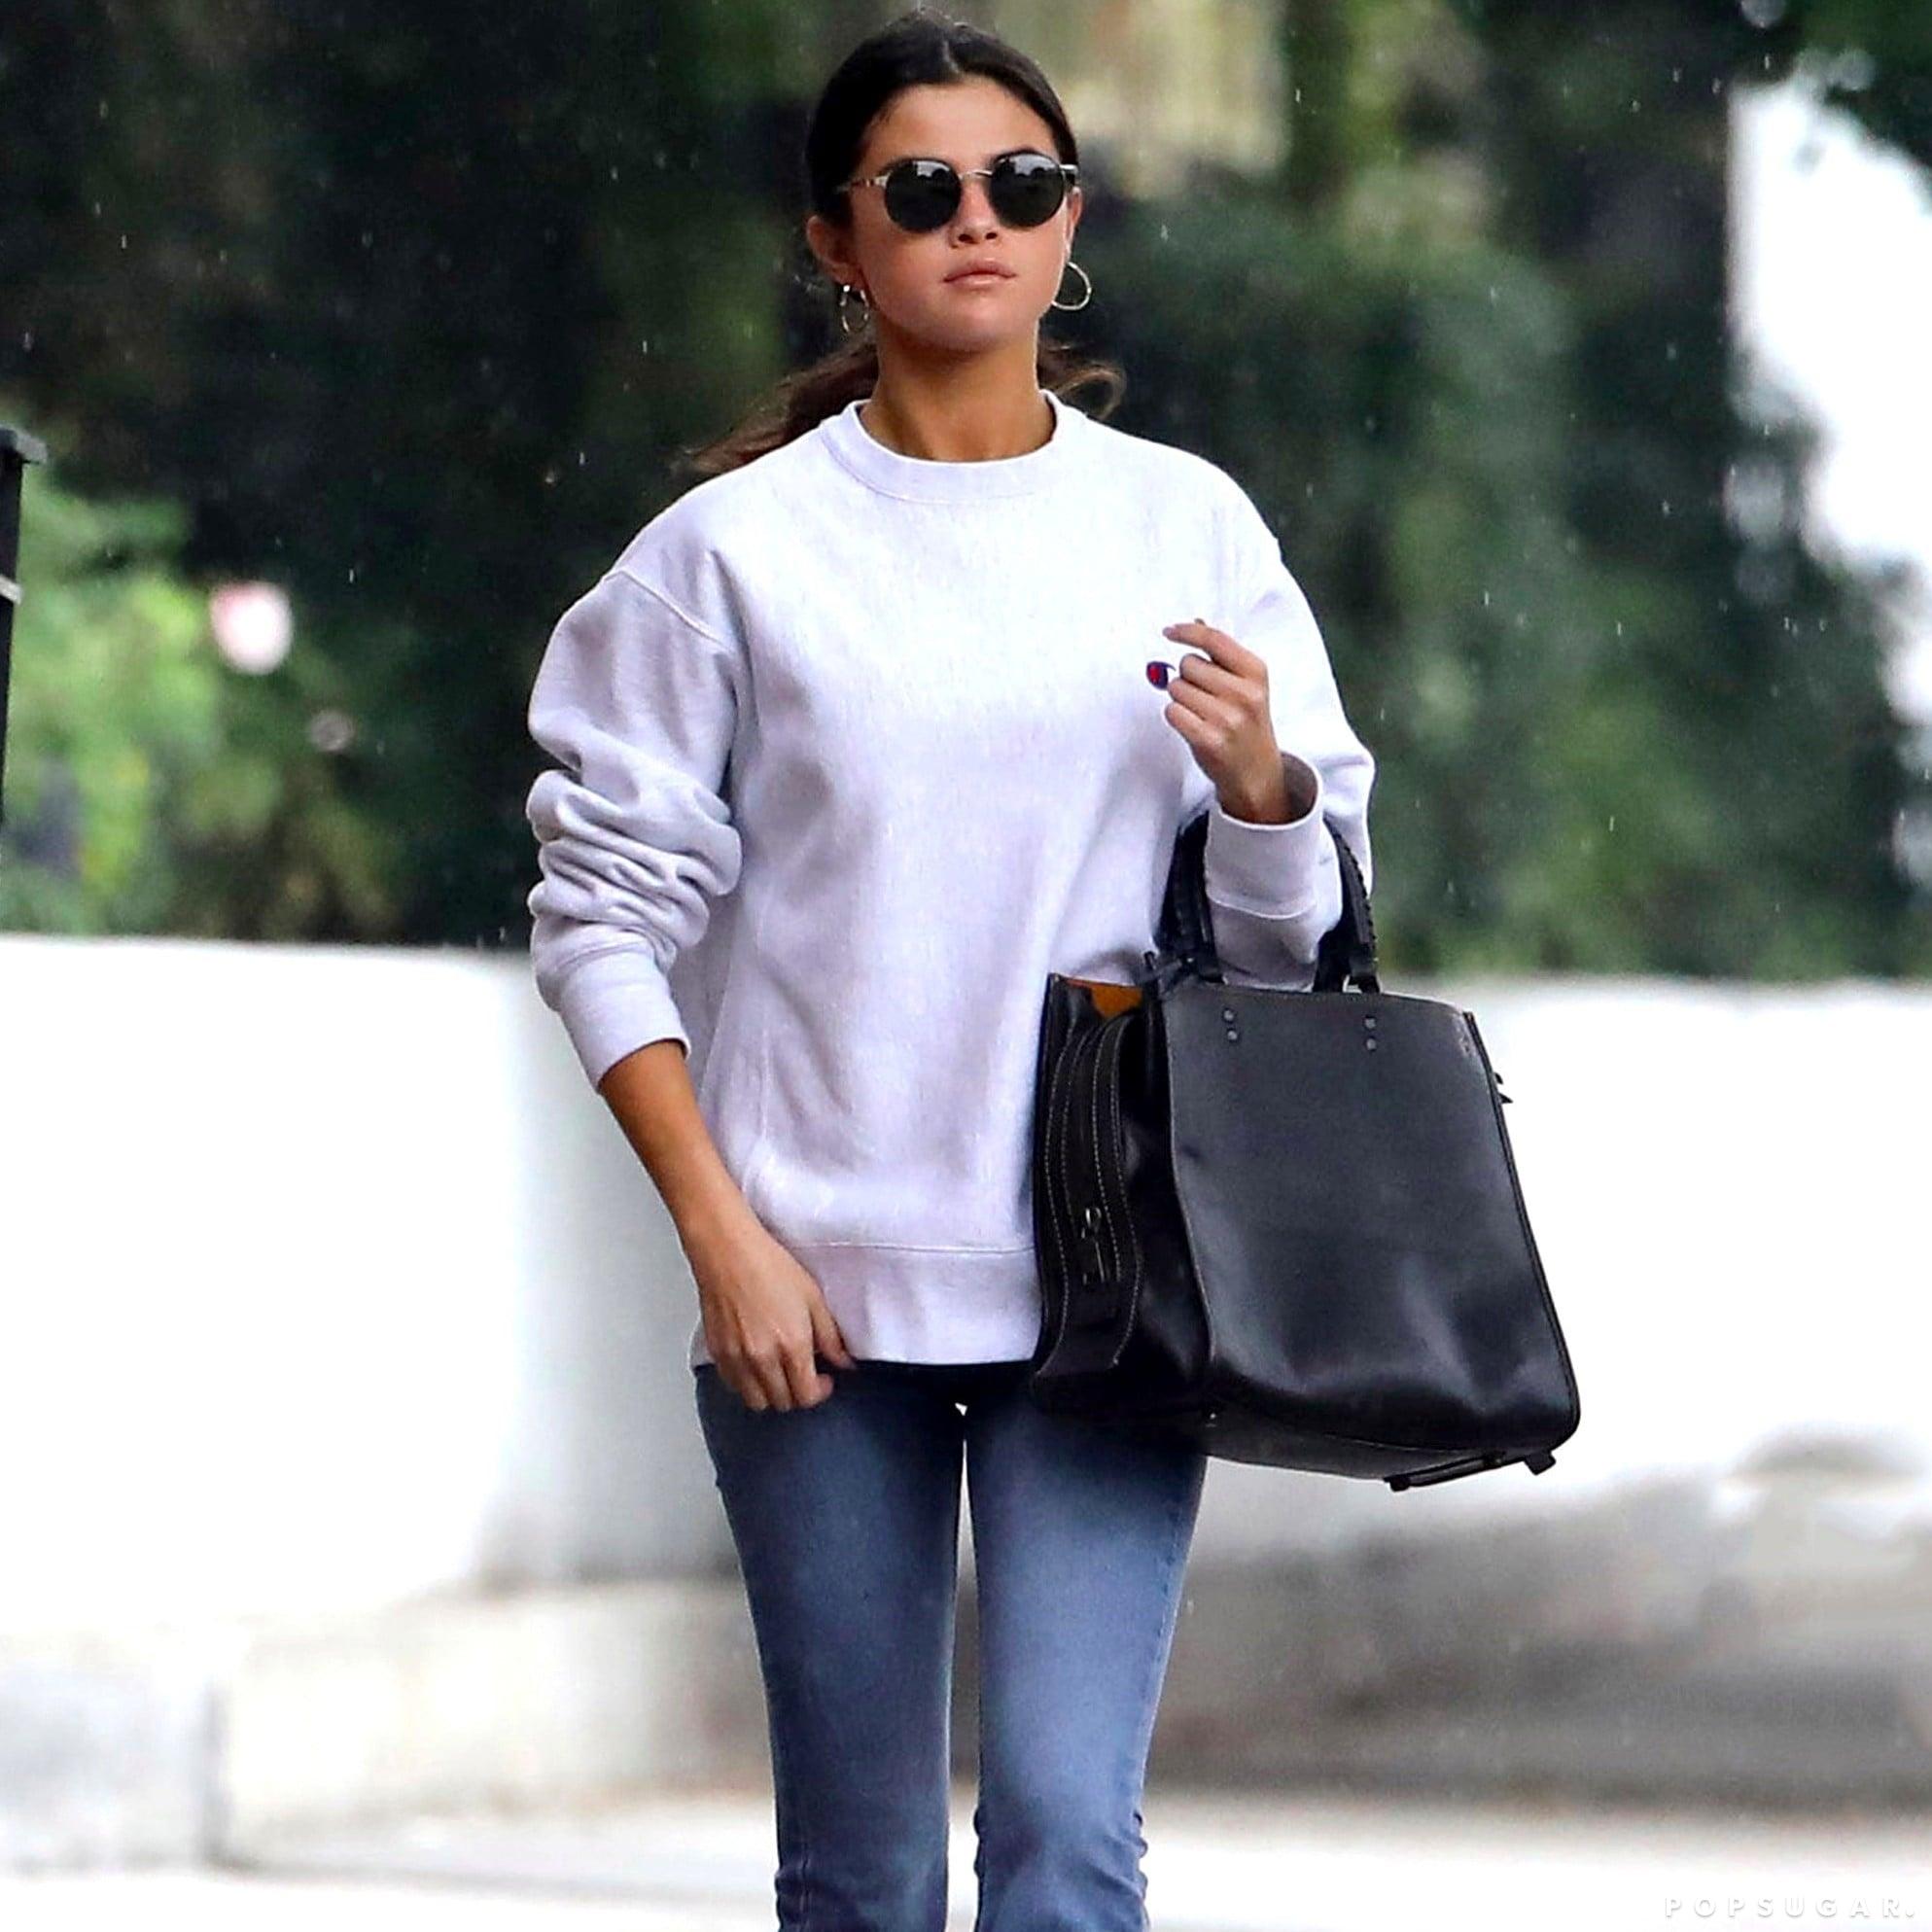 Selena Gomez Shares a Closet With The Weeknd   POPSUGAR Fashion